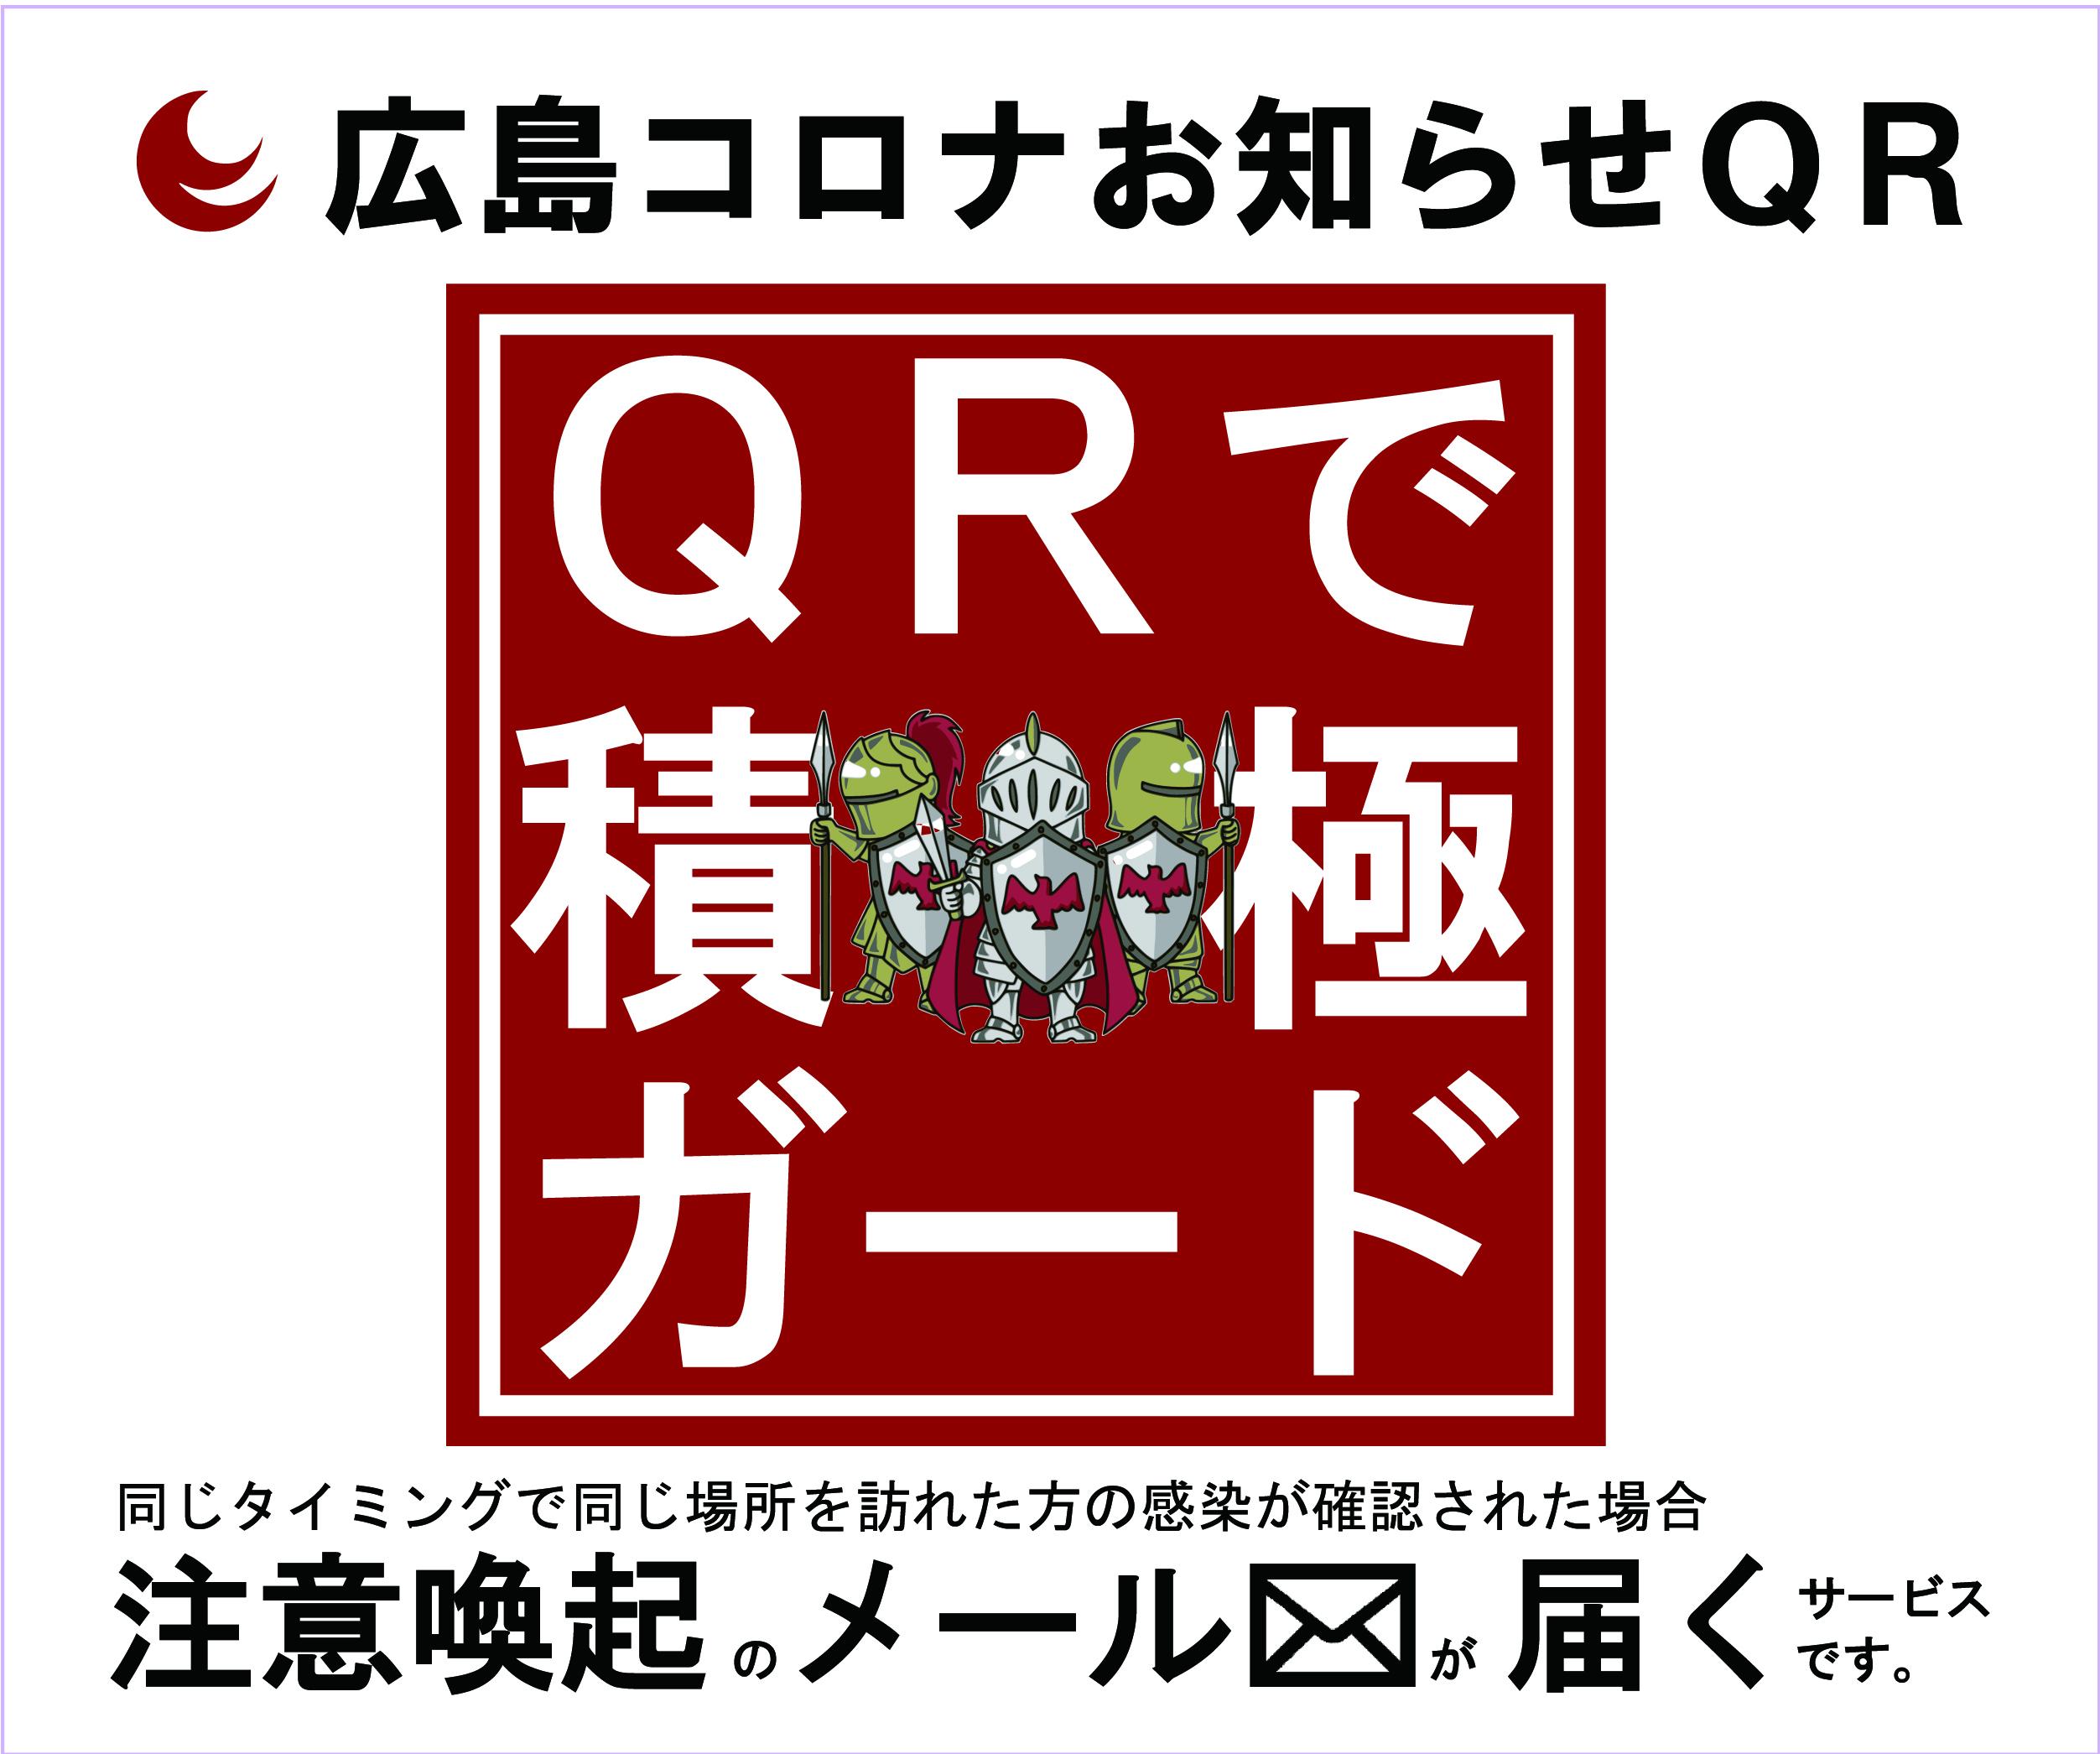 QRで積極ガード